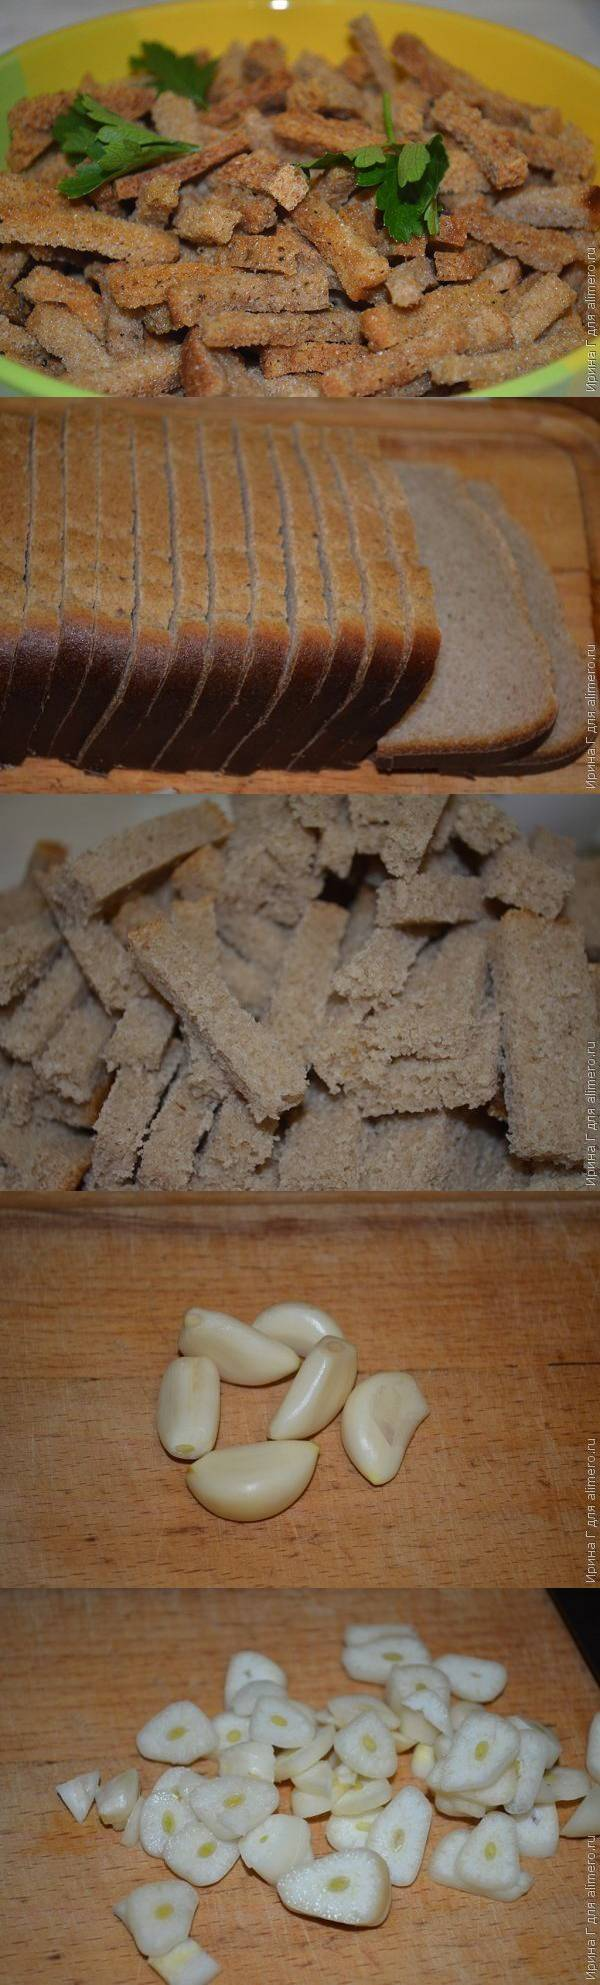 Кириешки в домашних условиях с чесноком фото рецепт